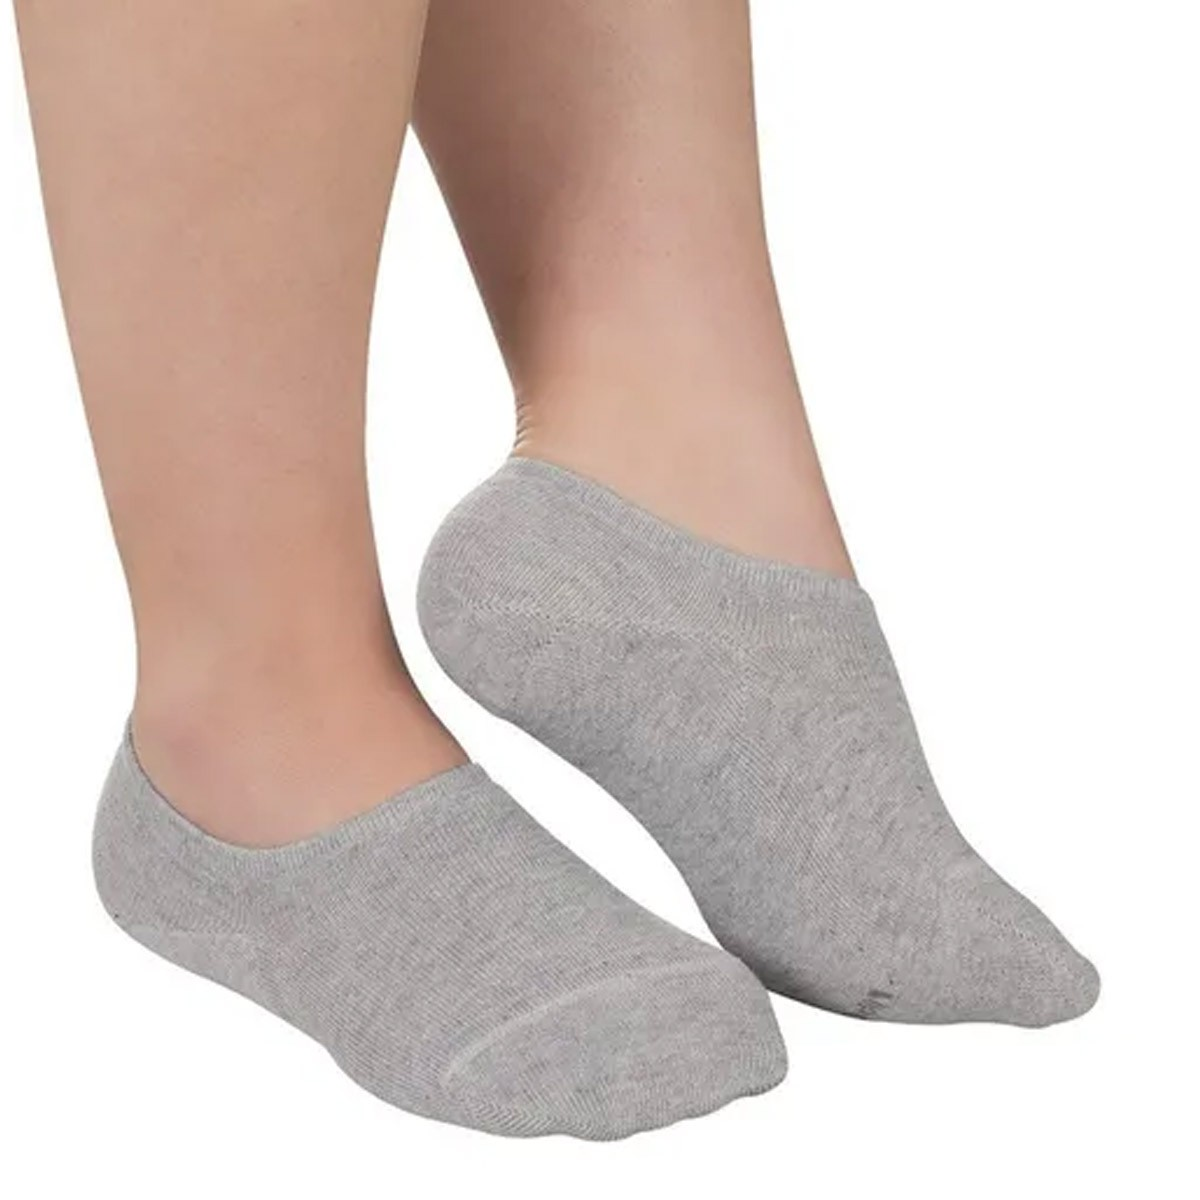 KIT com 3 meia sapatilha invisível feminina Lupo